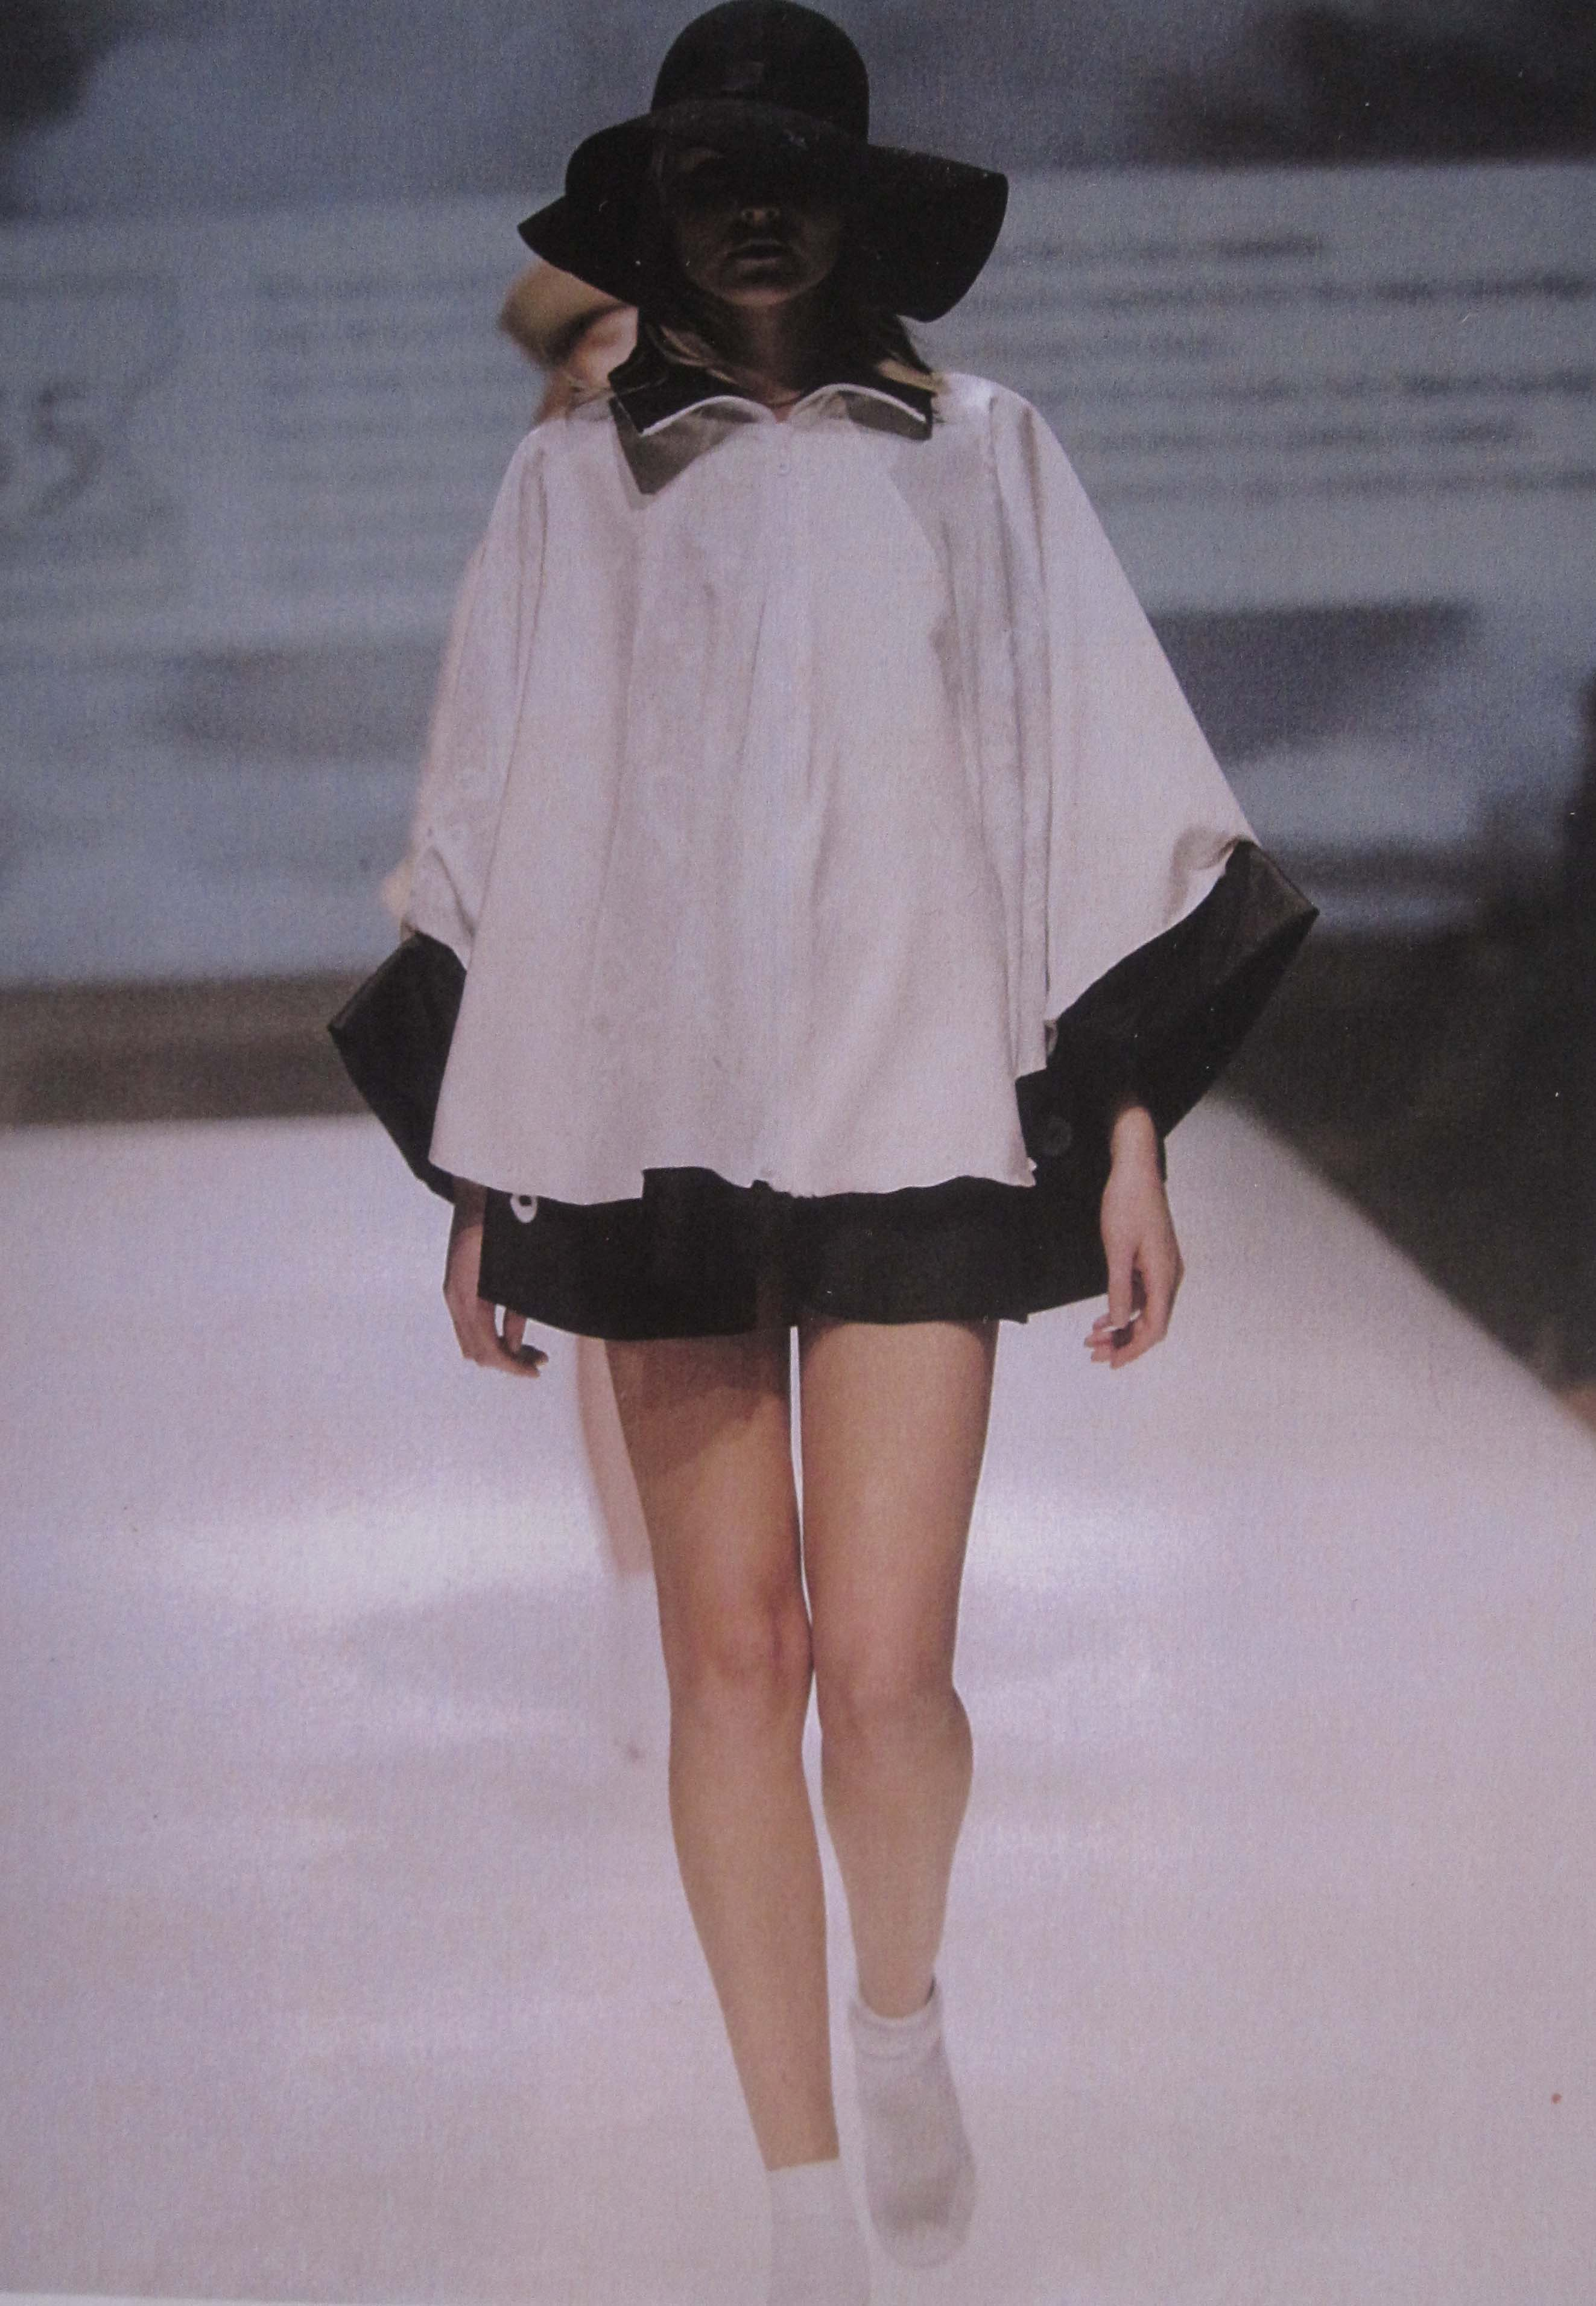 catwalk2.jpg